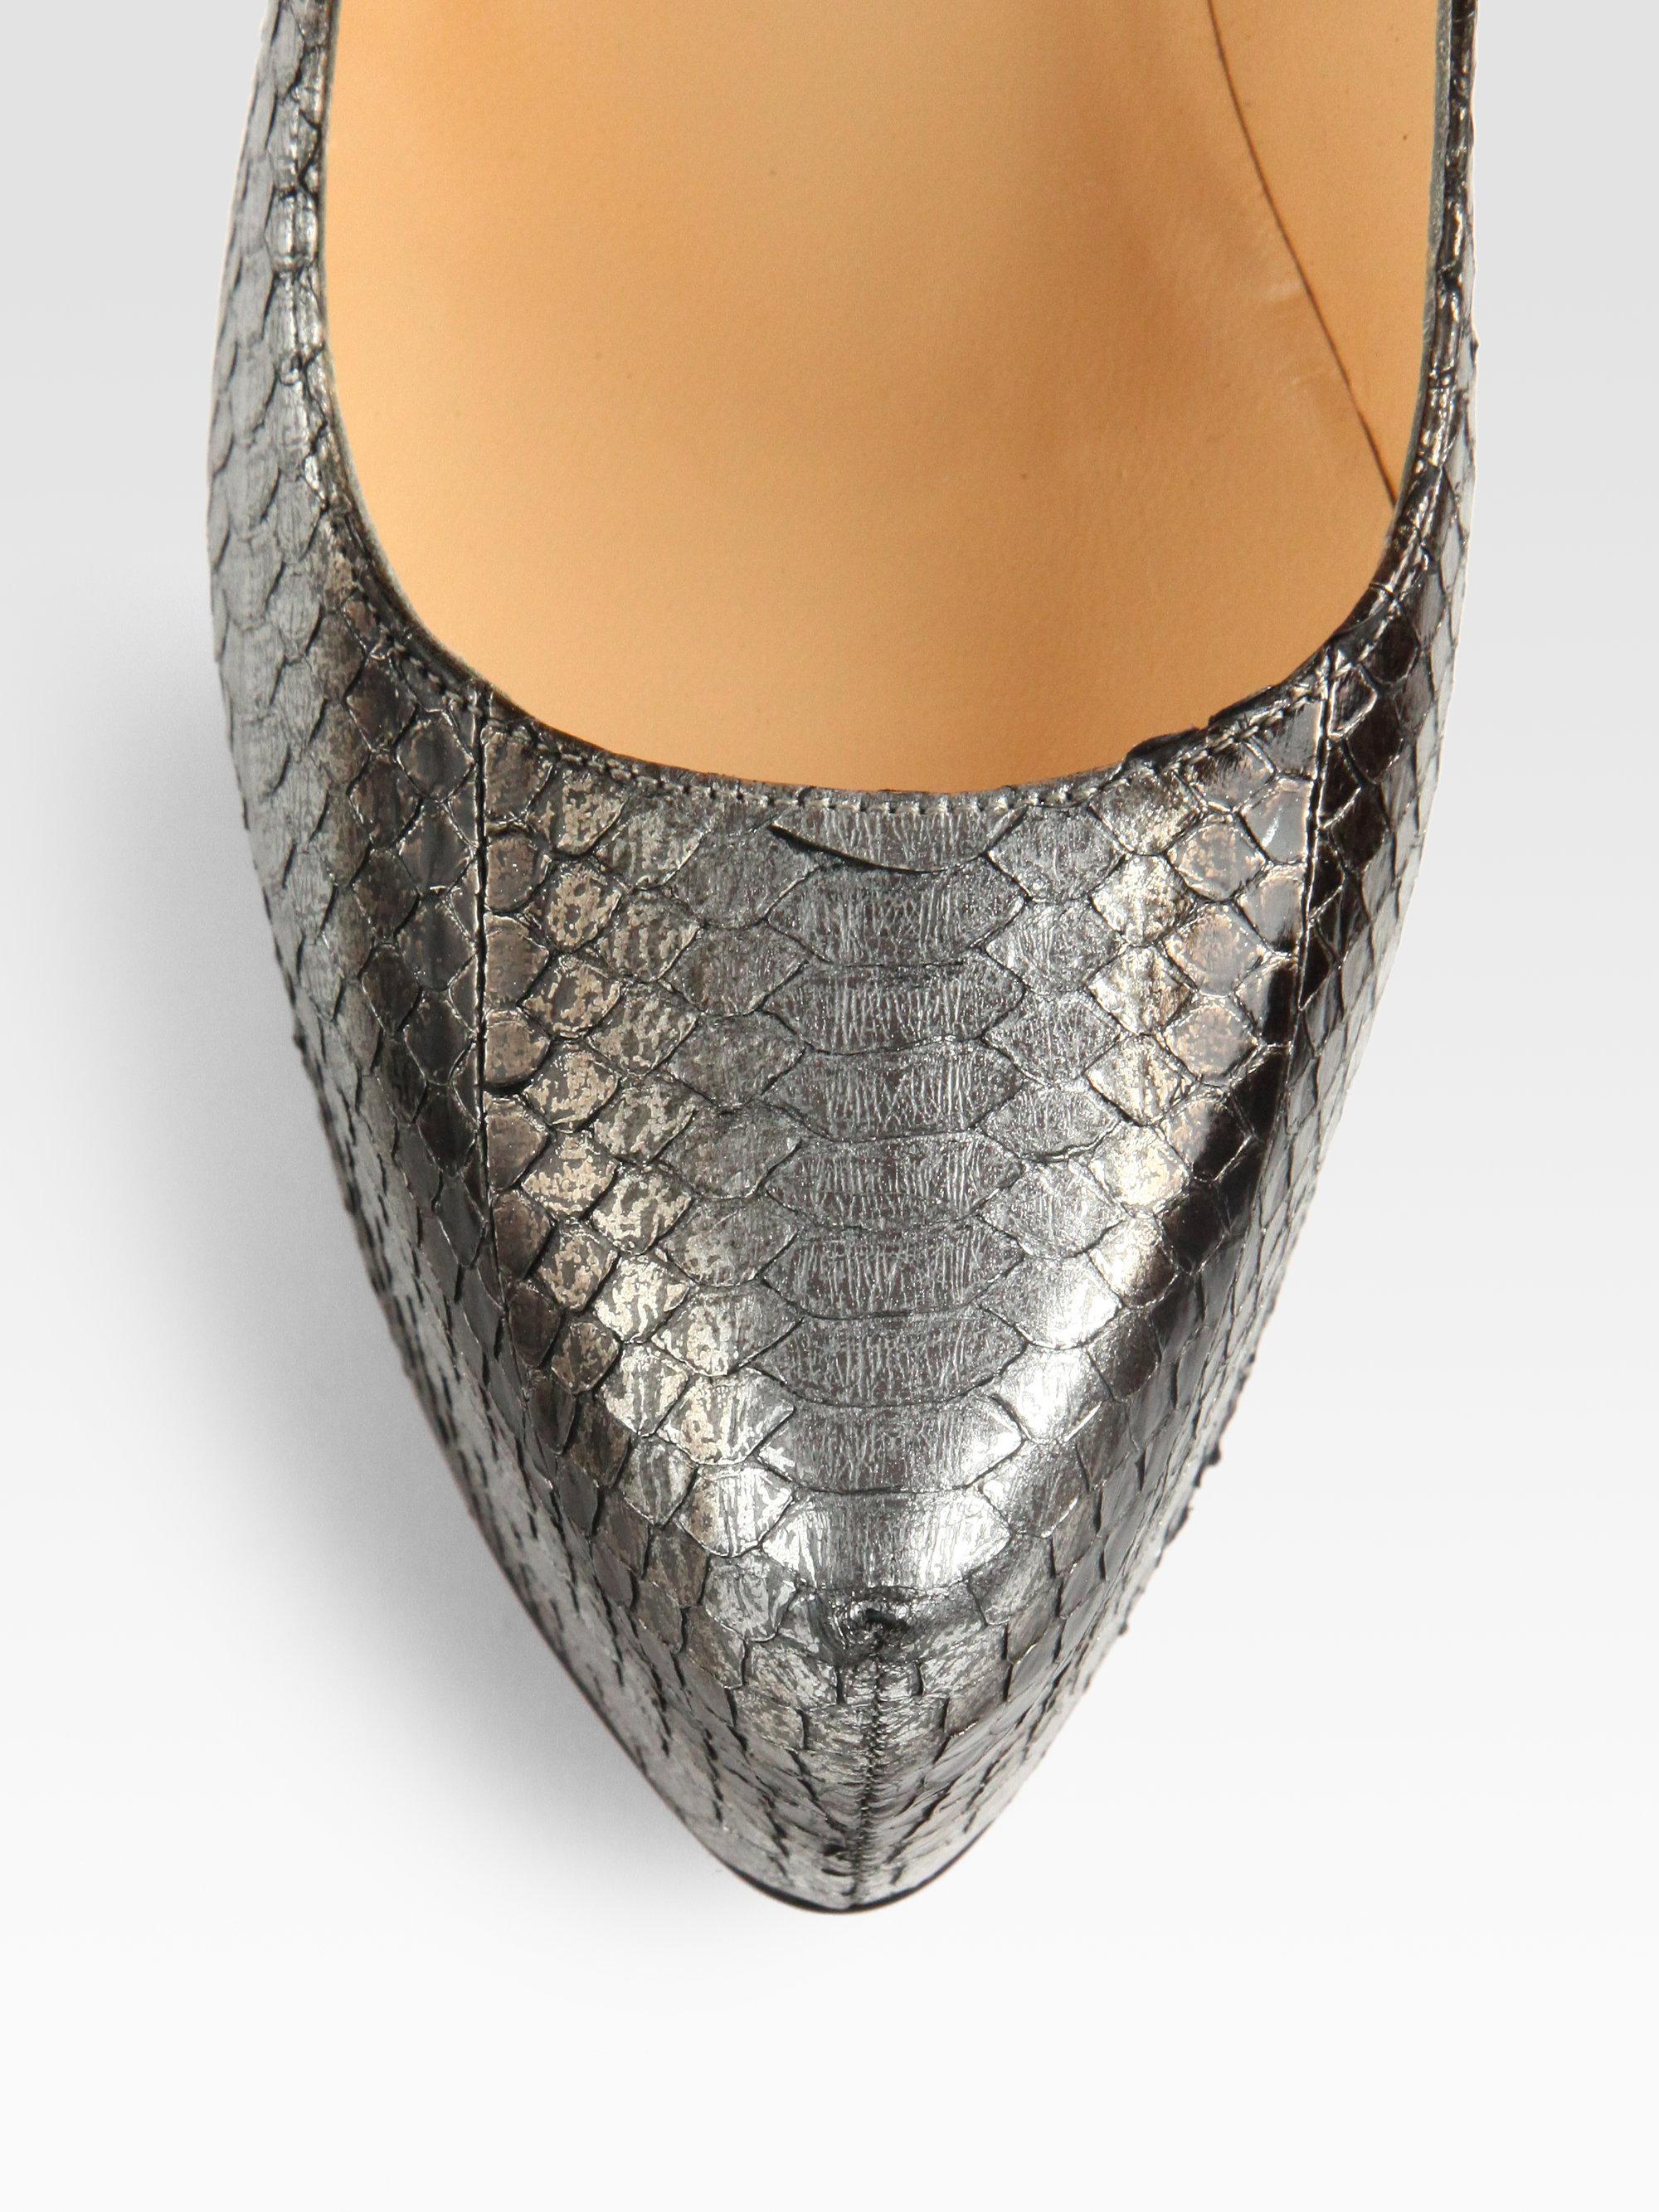 christian louboutin replica mens shoes - christian louboutin peep-toe pumps Silver metallic snakeskin | The ...